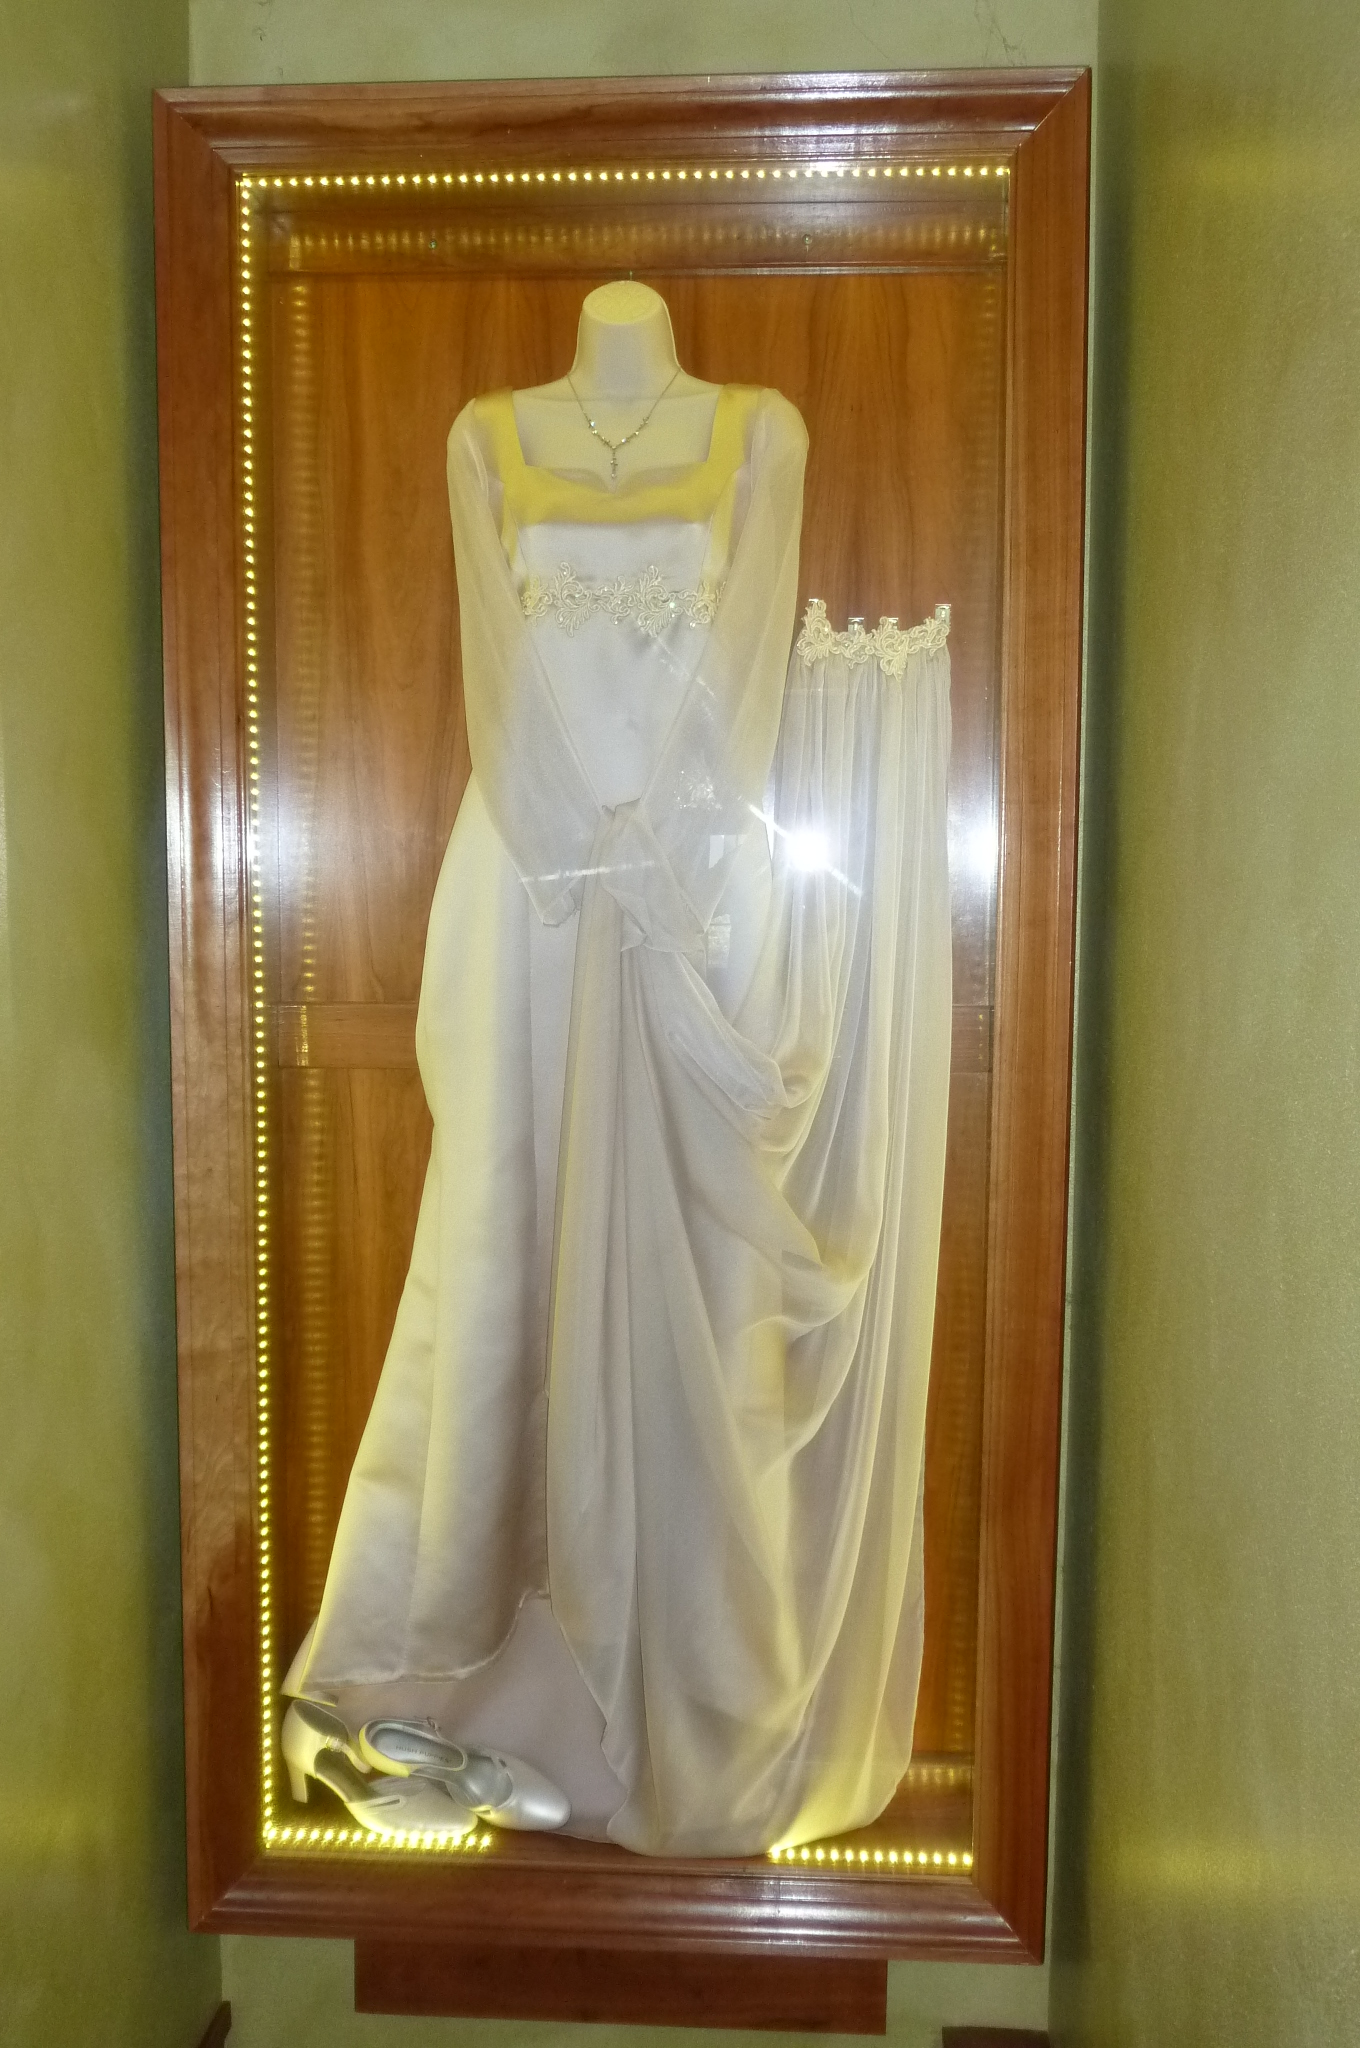 how to preserve a wedding dress in shadow box wedding shadow box Similiar Custom Wedding Dress Shadowbo Keywords